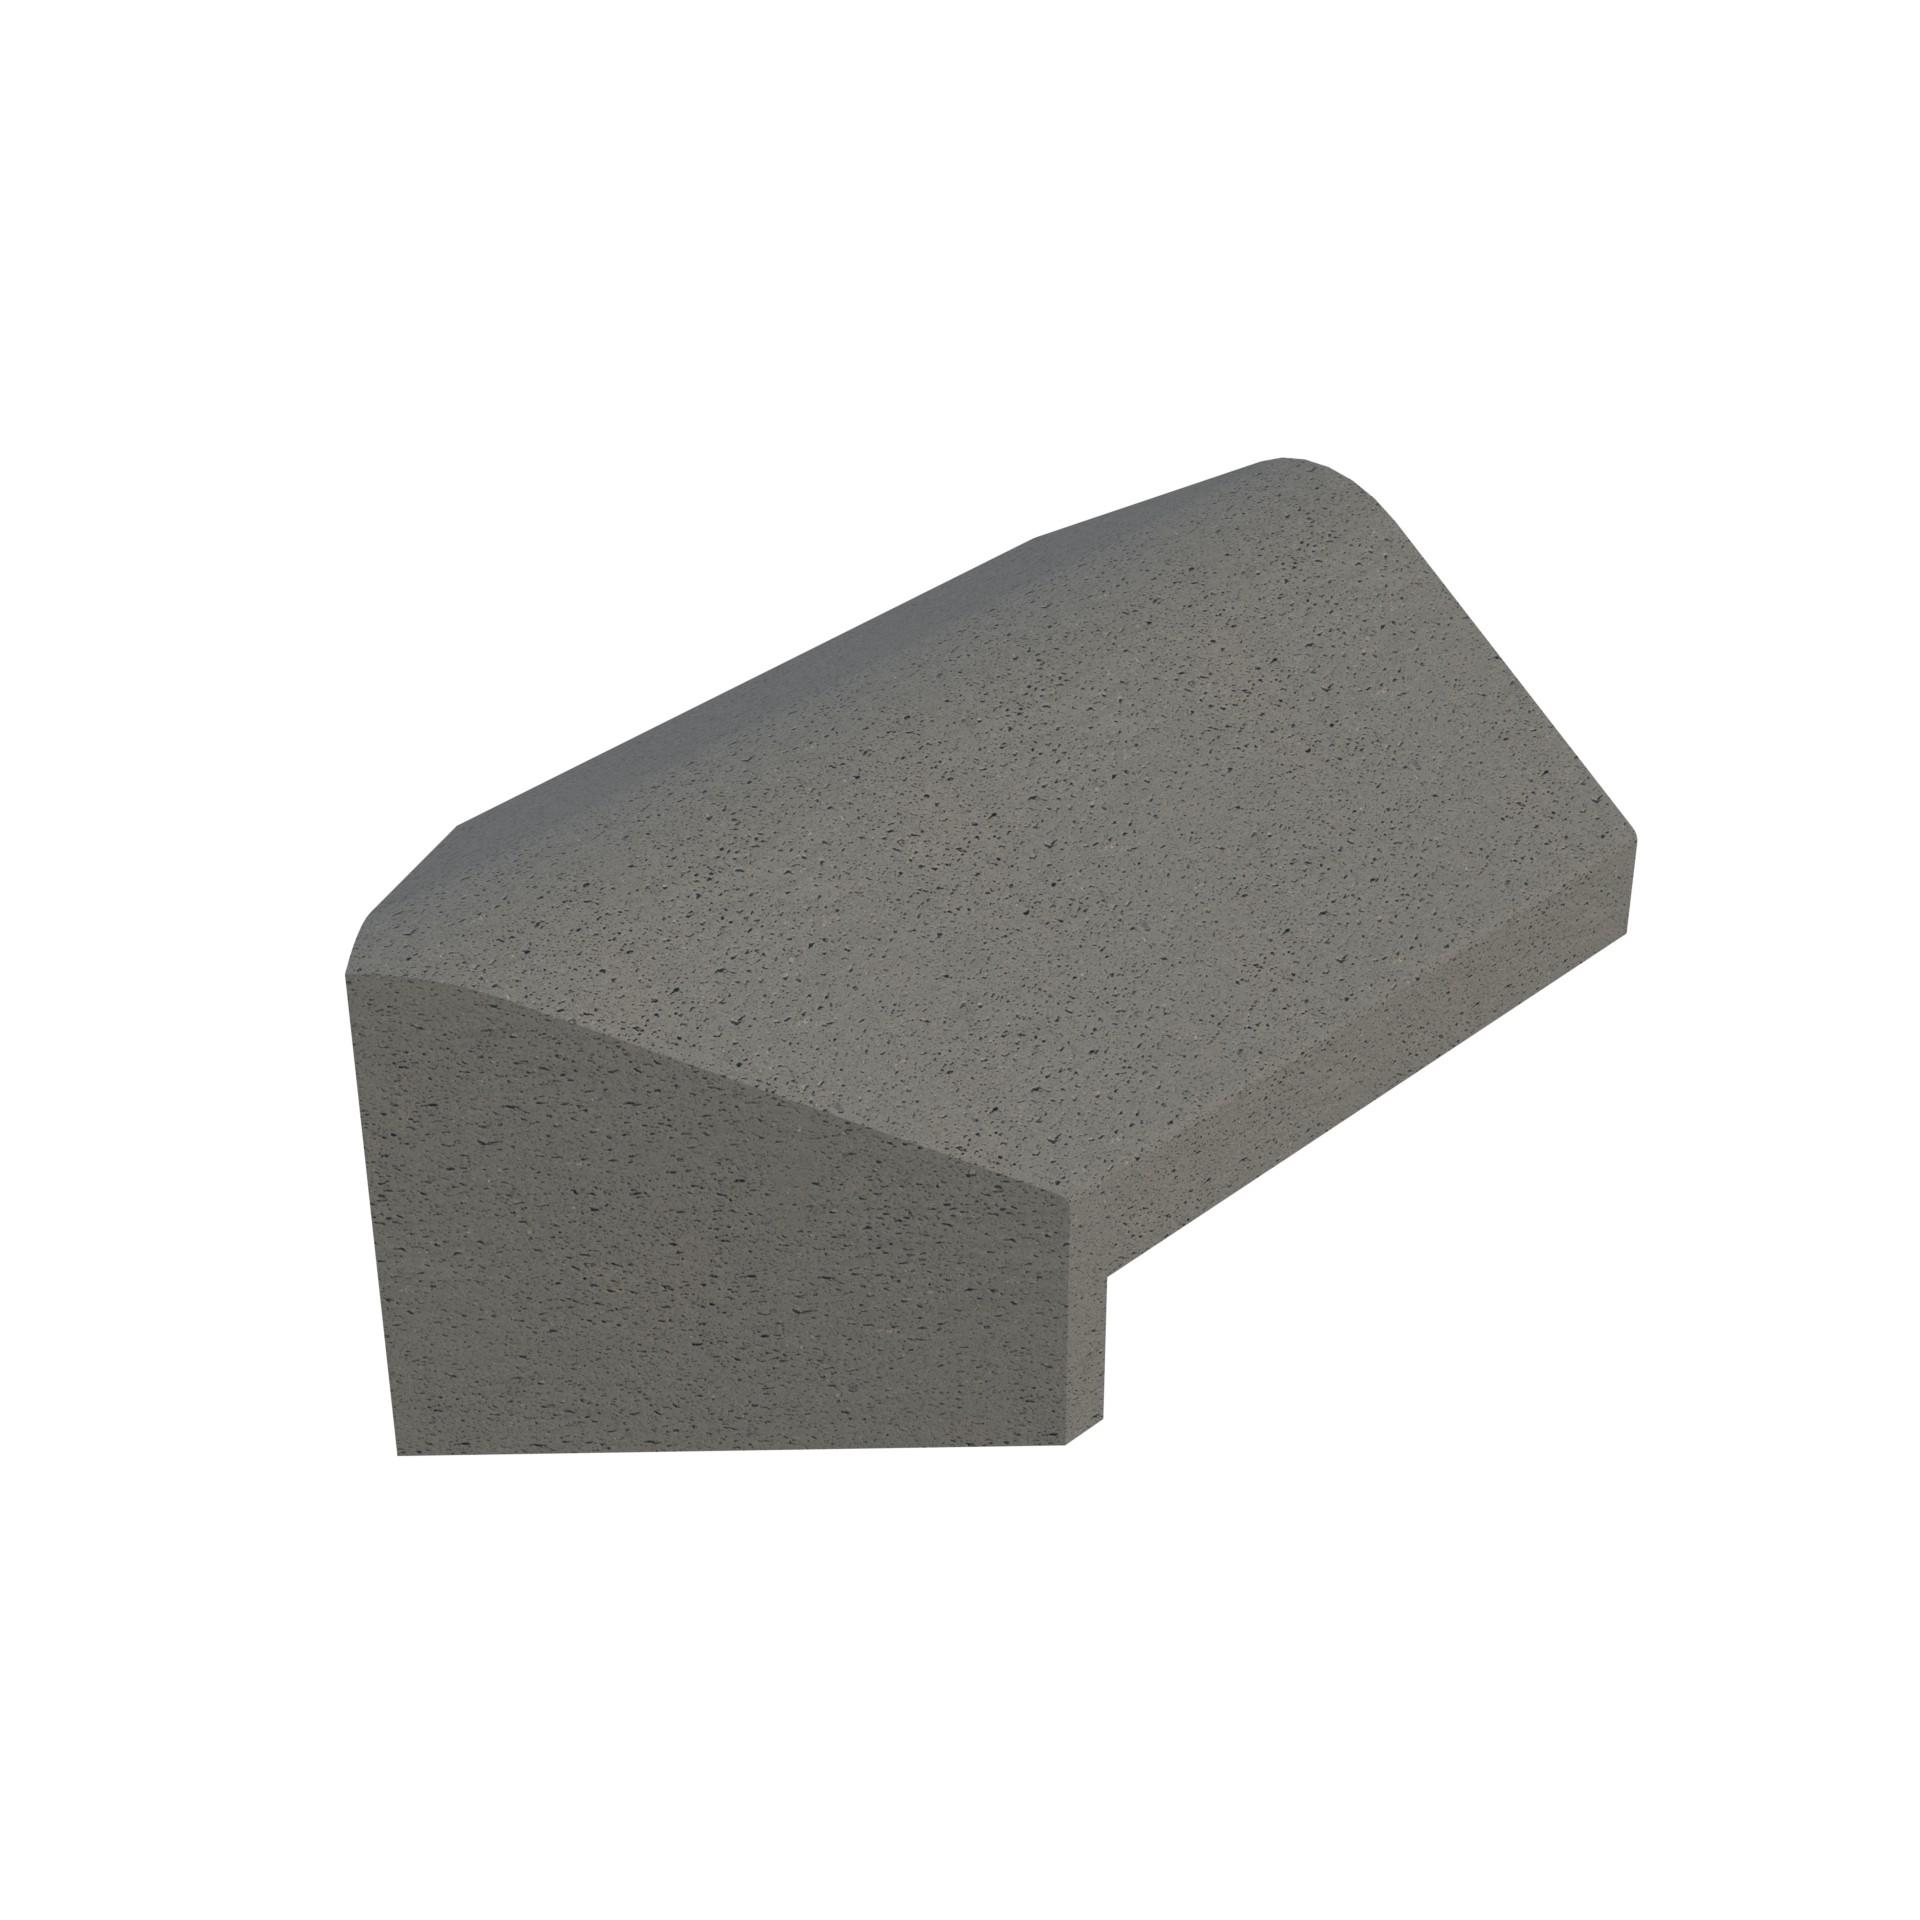 SANDTOFT TILES - Concrete Legged Angle Hip Starter Ridge